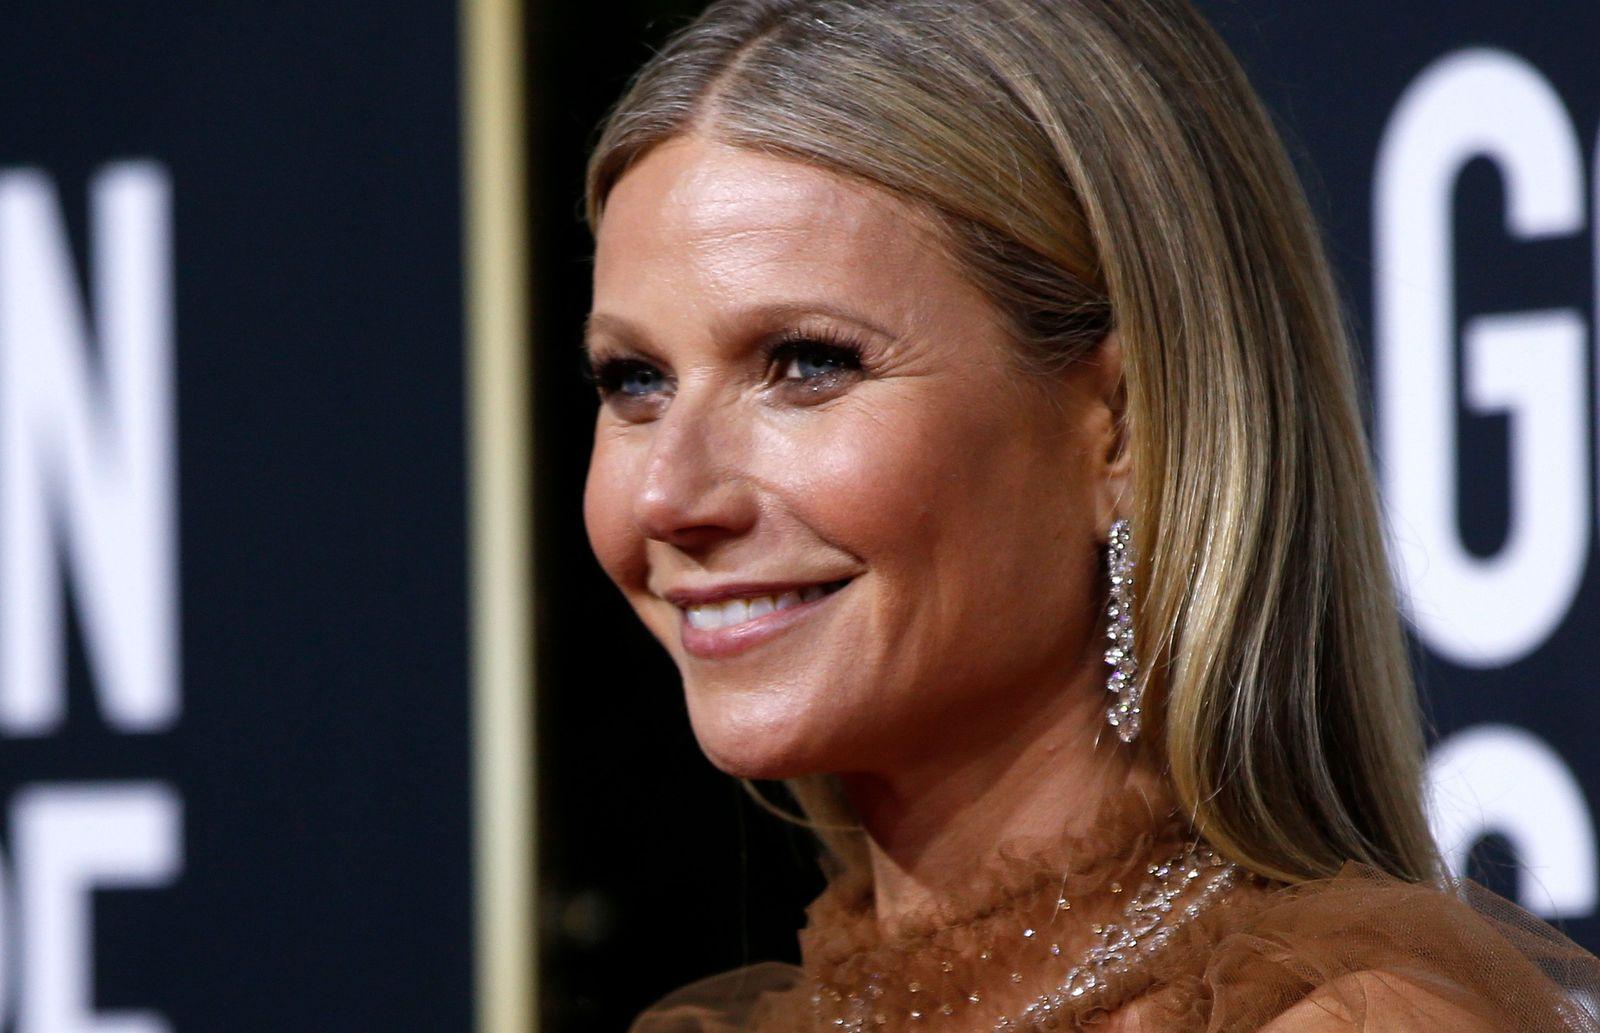 77th Golden Globe Awards - Arrivals - Beverly Hills, California, U.S., January 5, 2020 - Gwyneth Paltrow